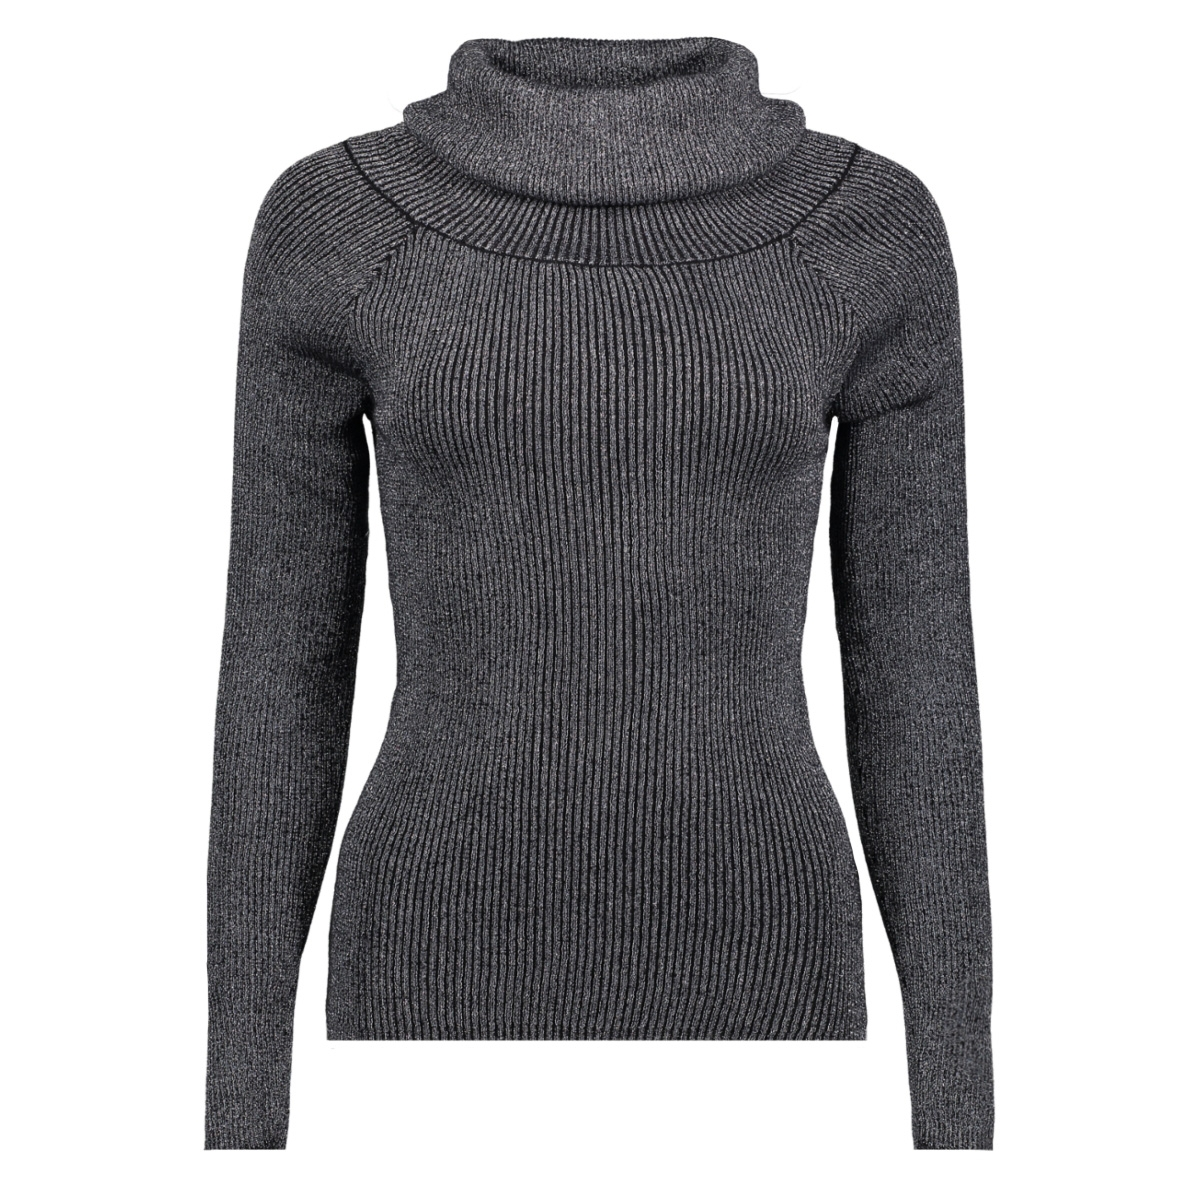 vivenna l/s offshoulder knit top 14043817 vila trui black/silver lur